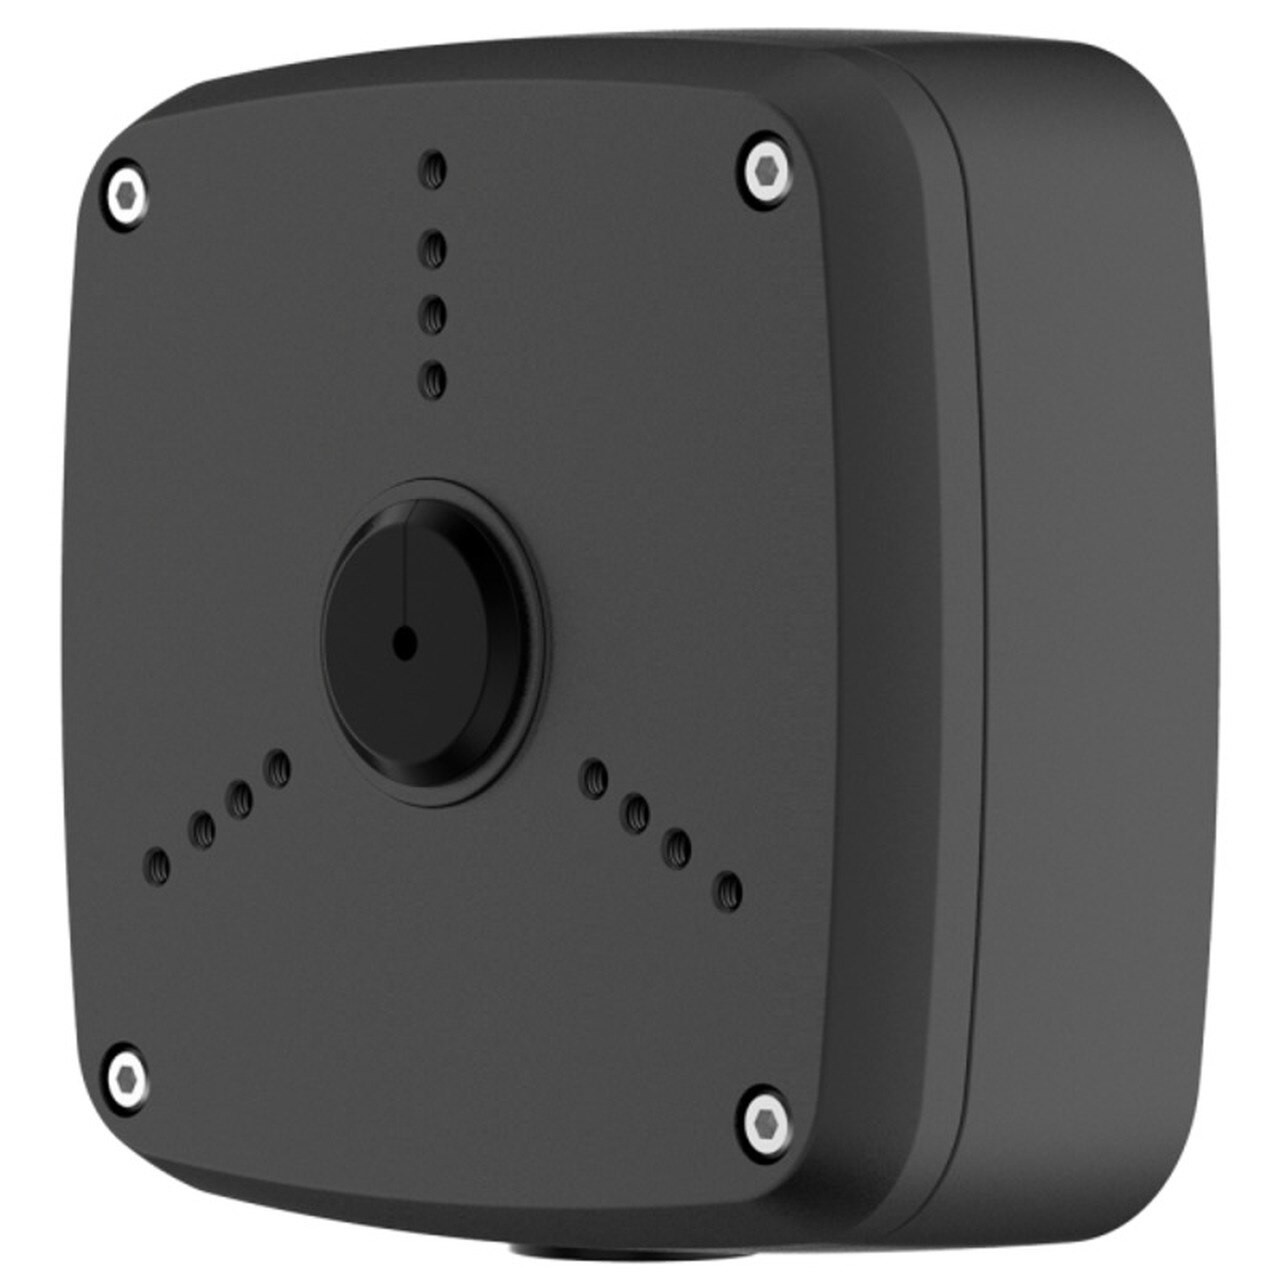 TURM witterungsfeste Anschlussbox IP66 aus Aluminum, Schwarz